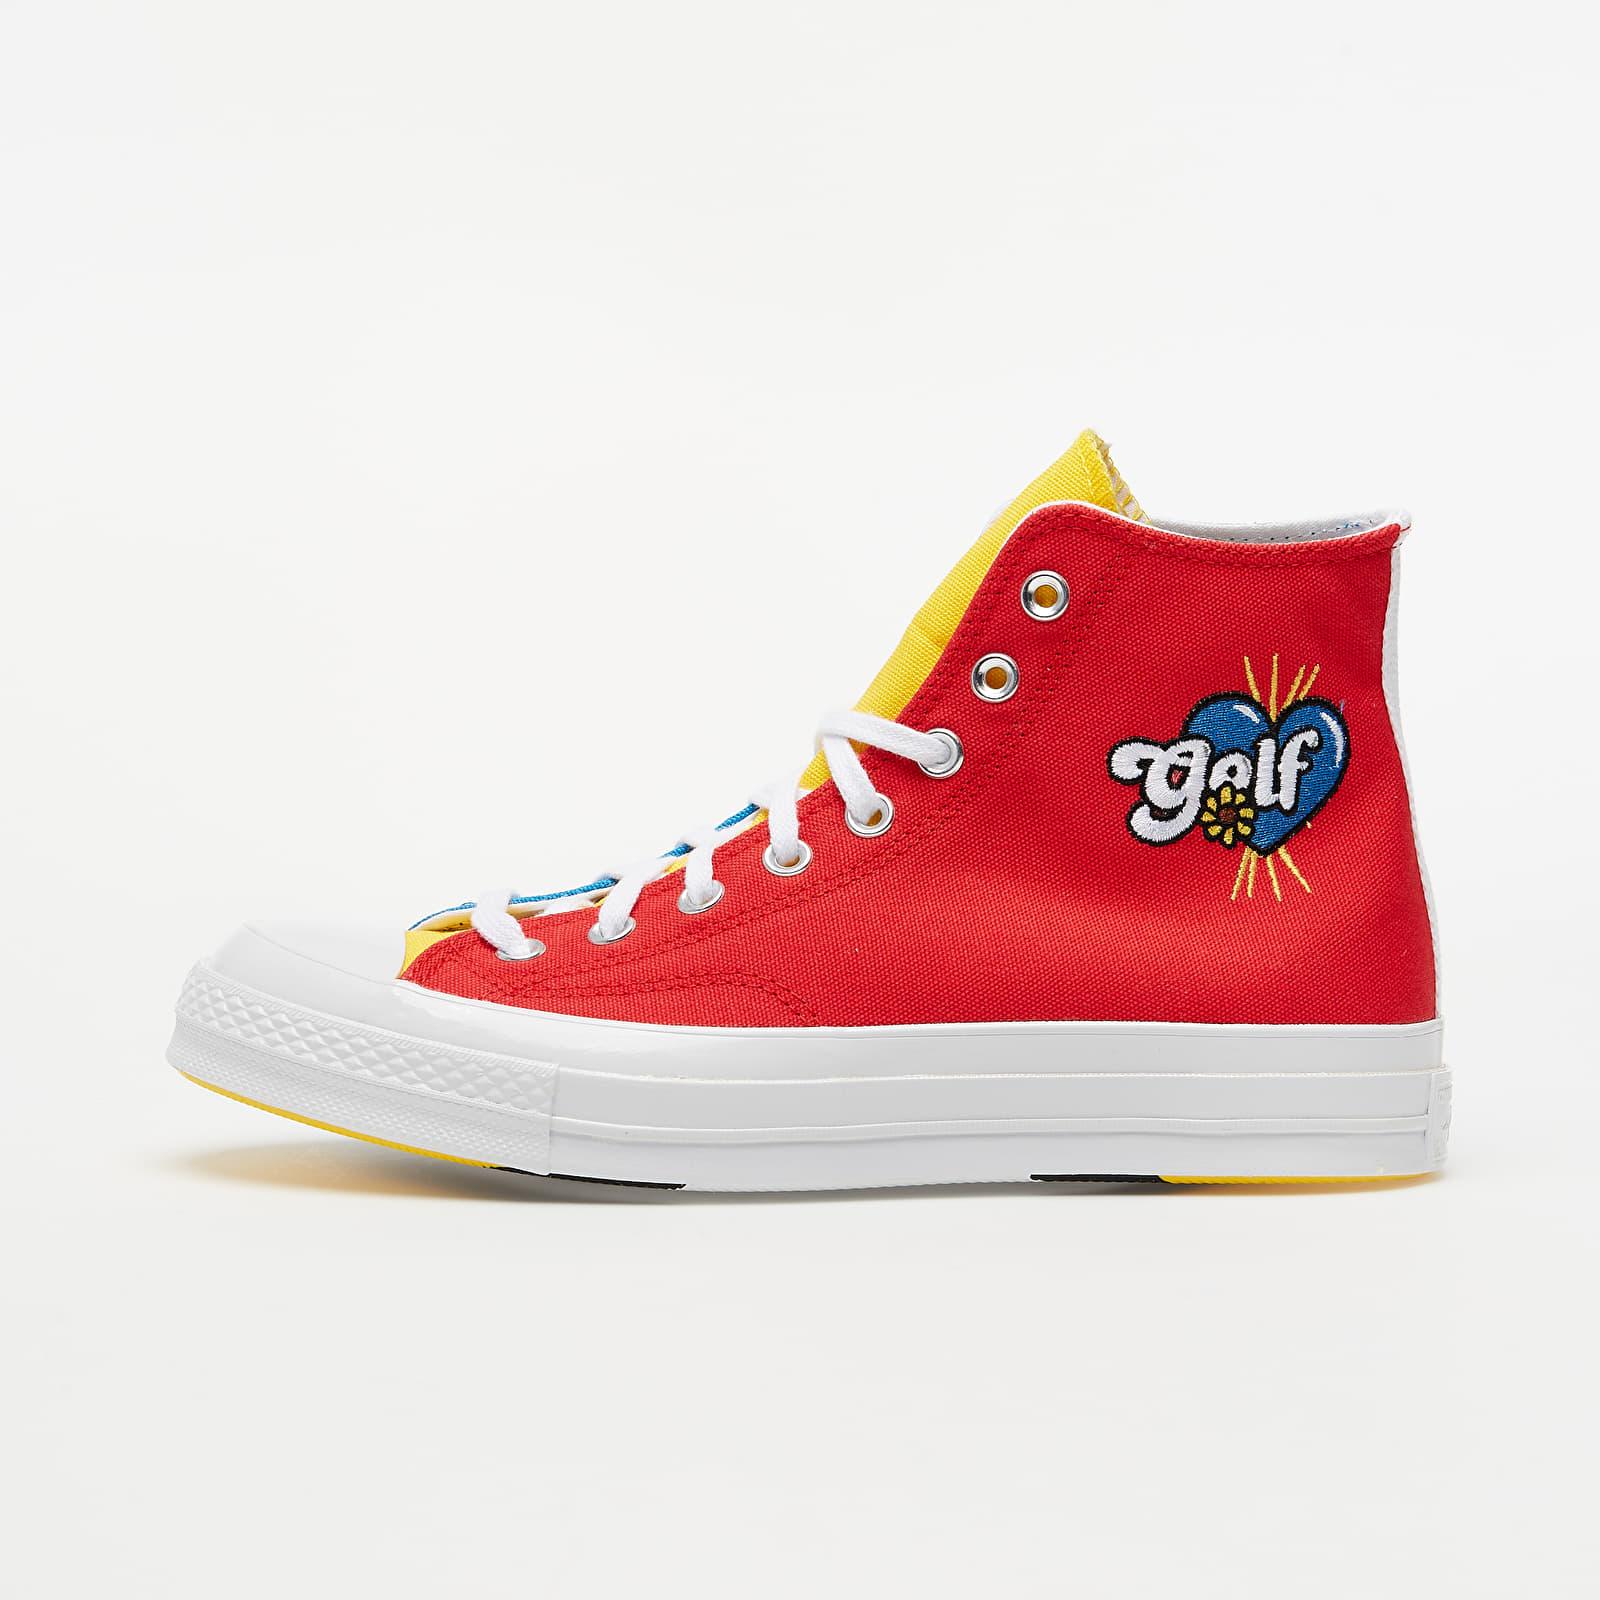 Converse x Golf Wang Chuck 70 Blue Yellow/ Red 169910C